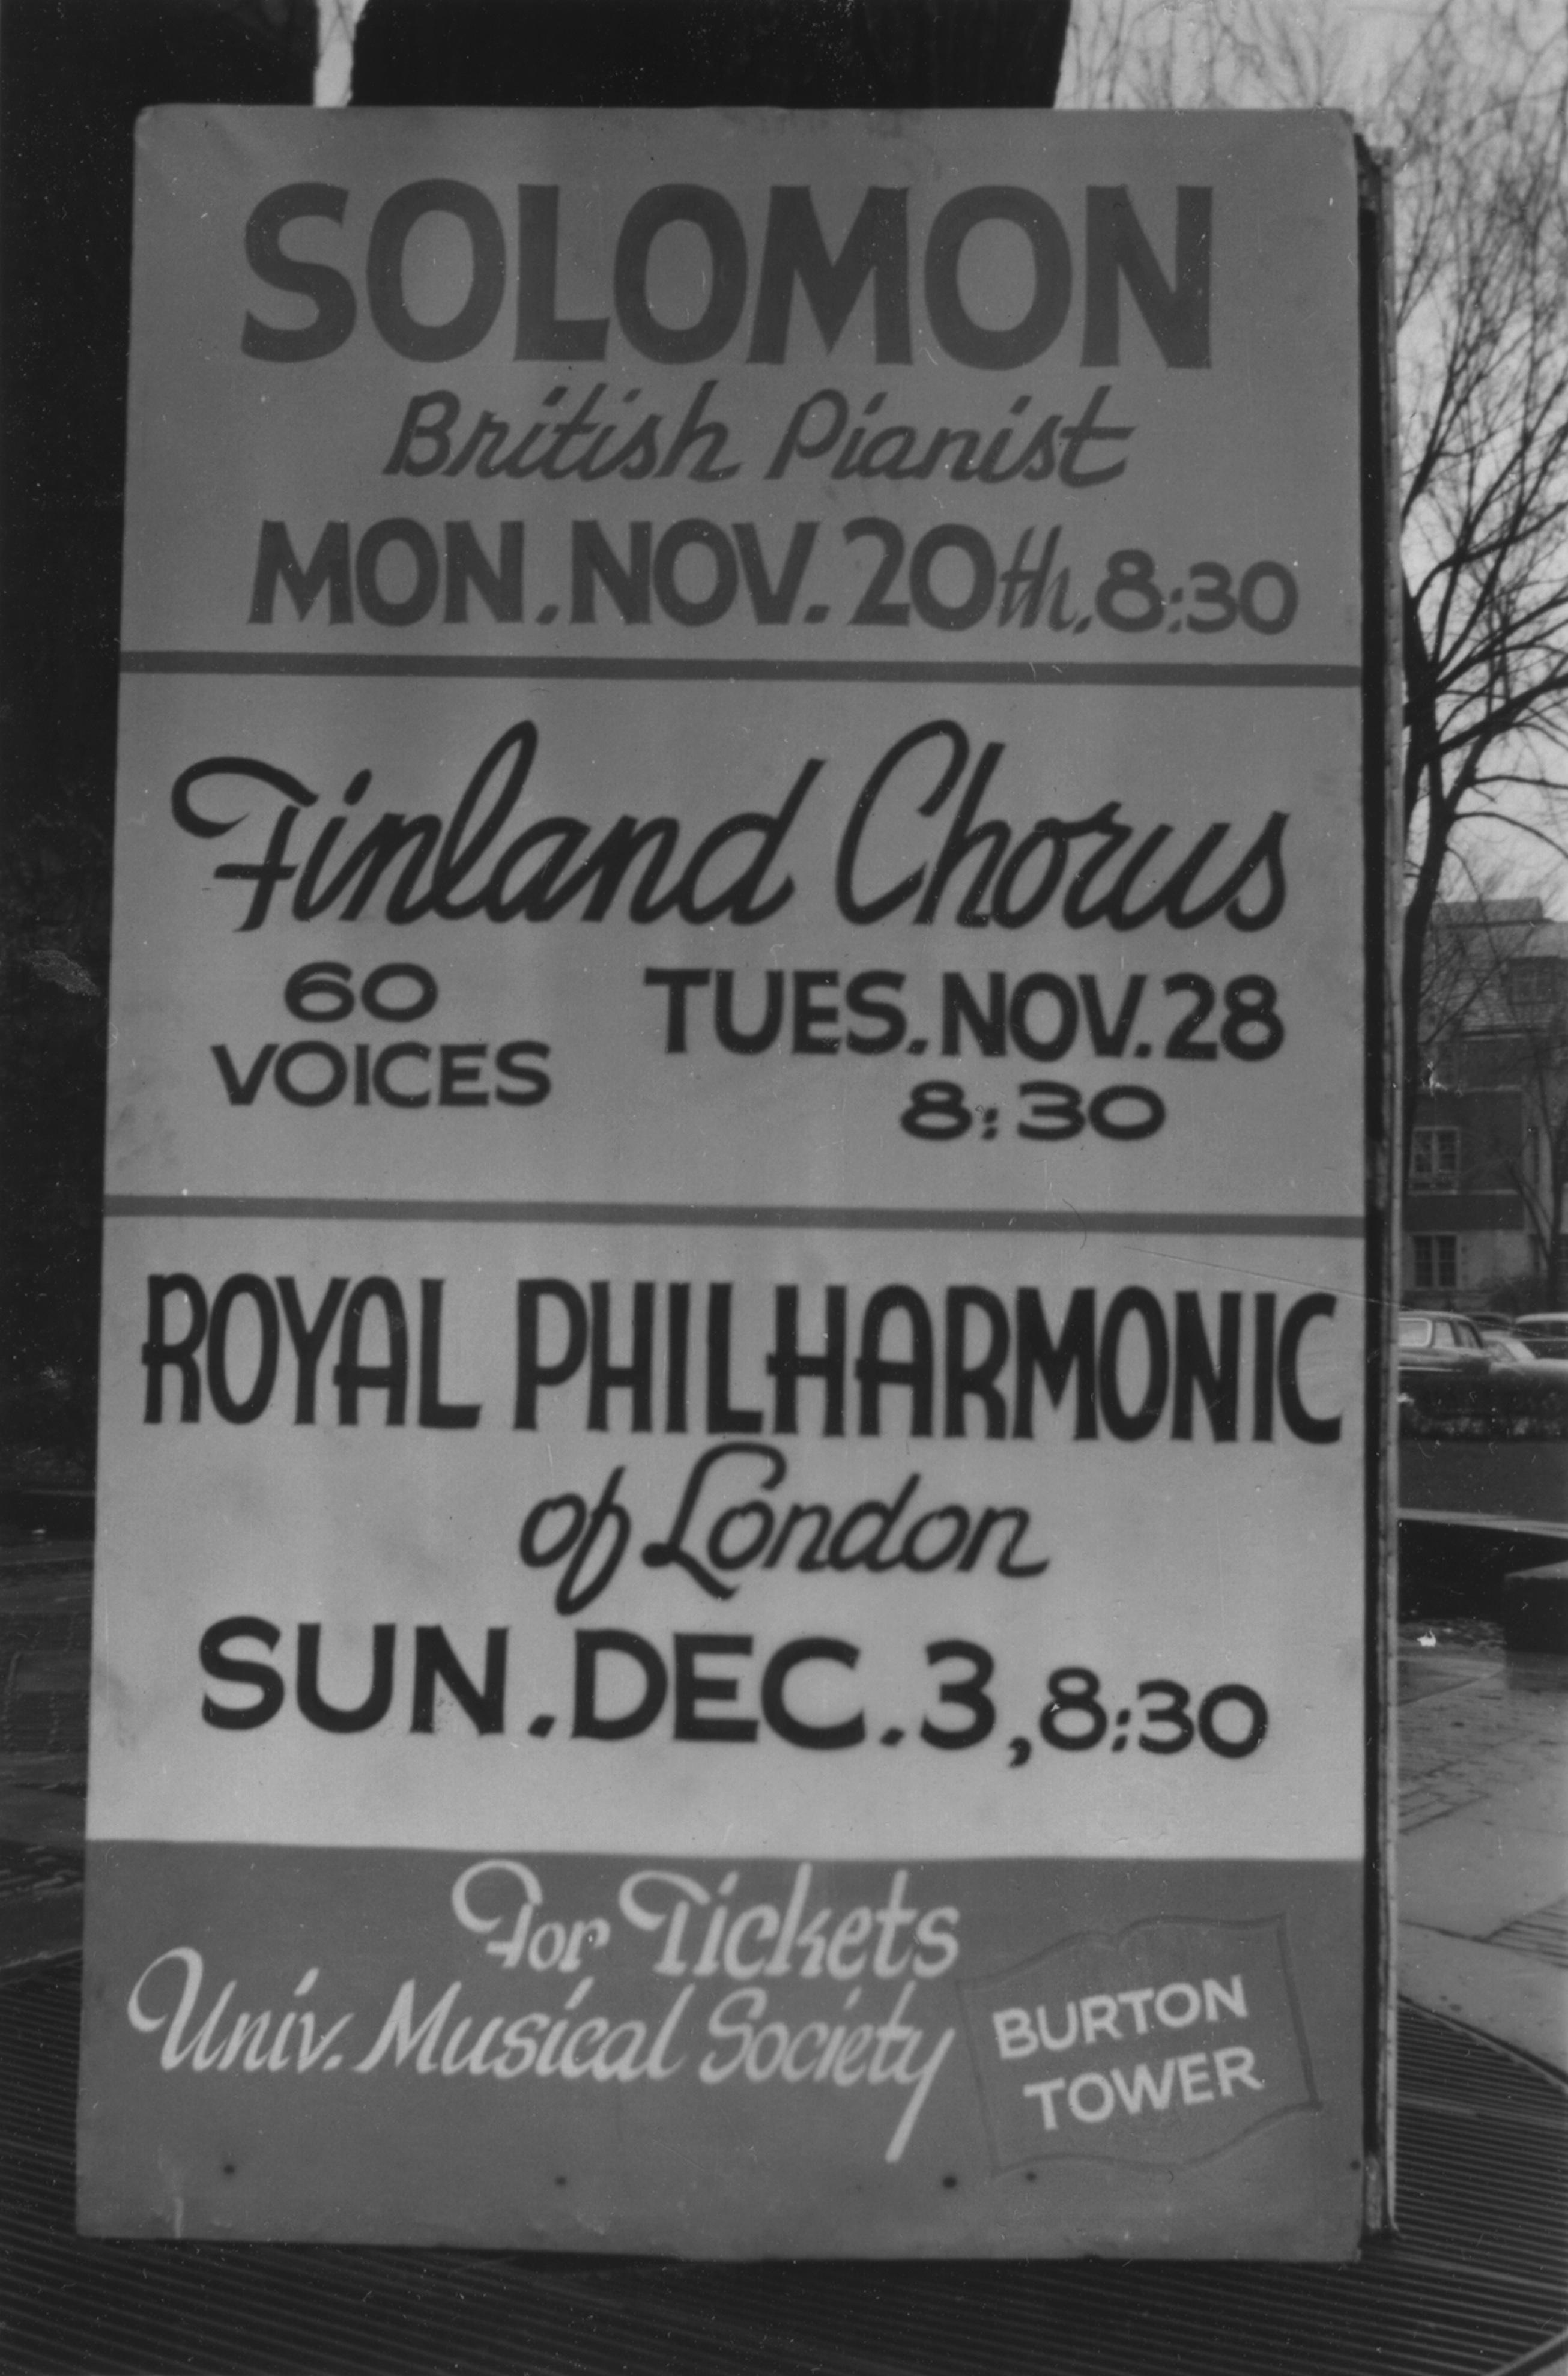 Soloman, Finland Chorus, and the Royal Philharmonic of London